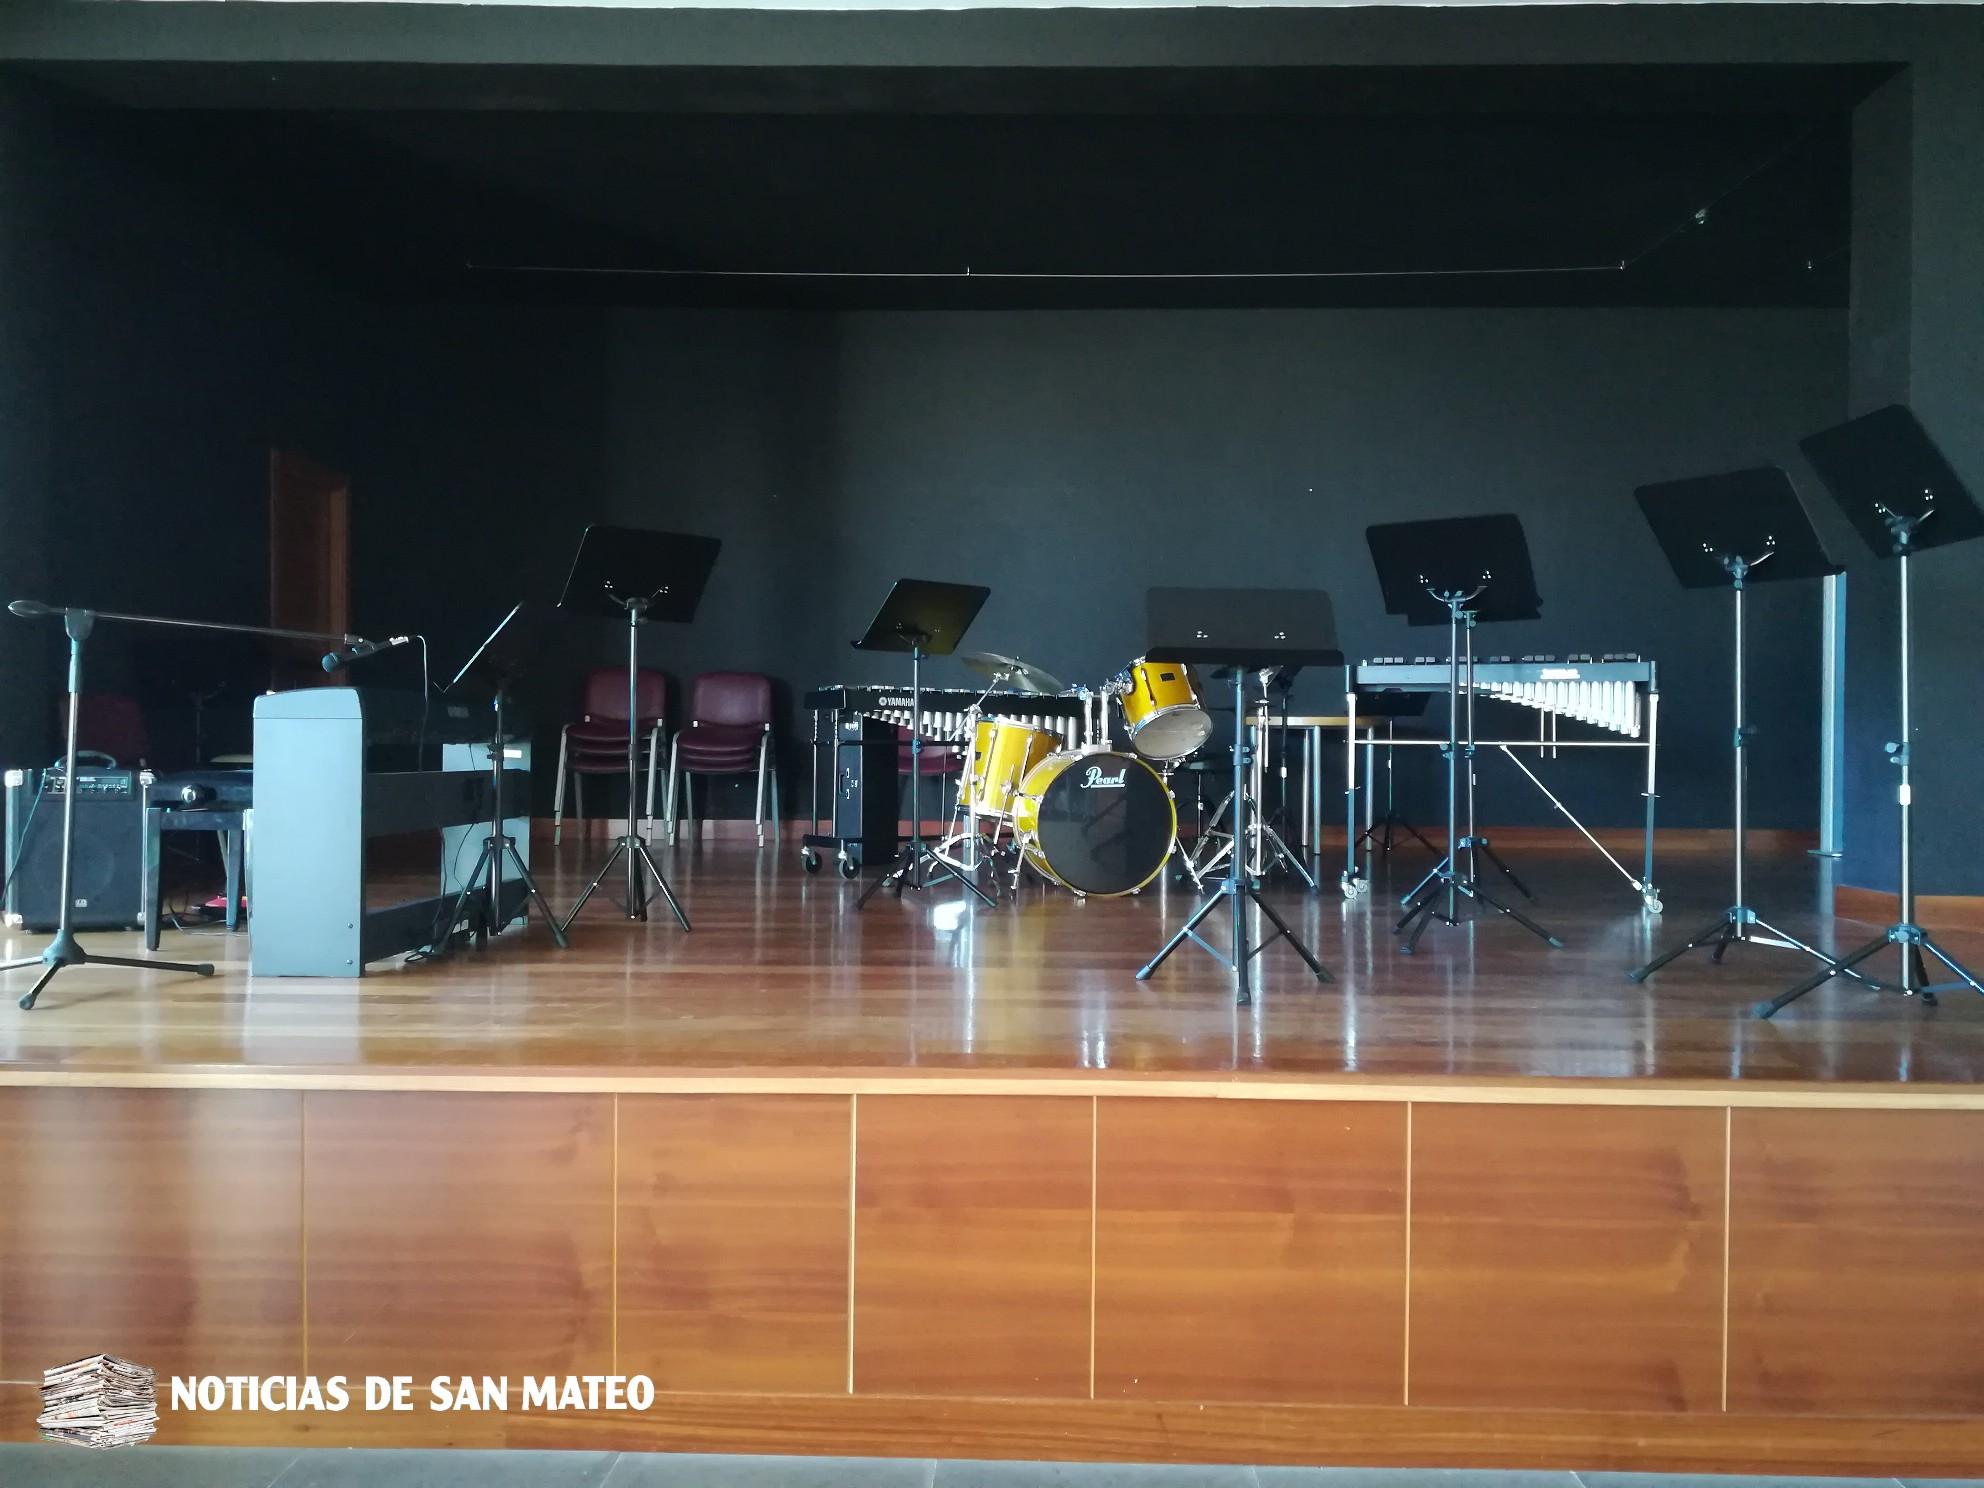 audicion_escuela_musica1.jpg